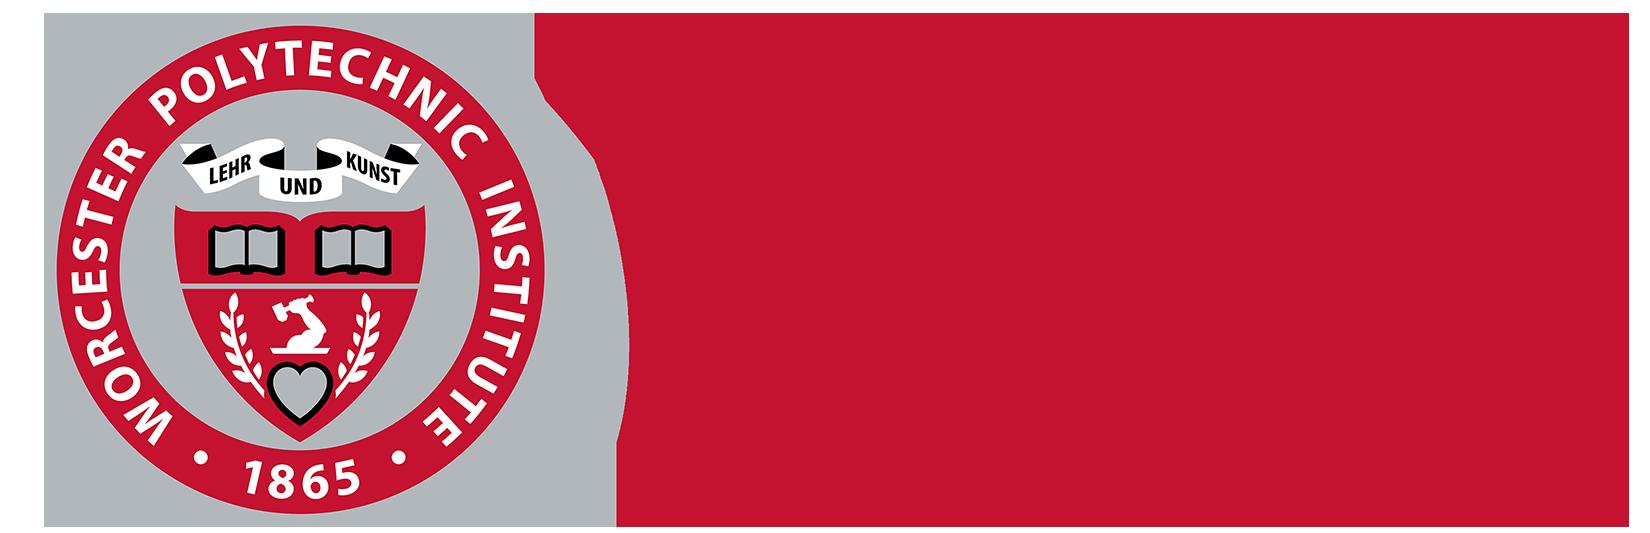 WPI Funding Toolkit